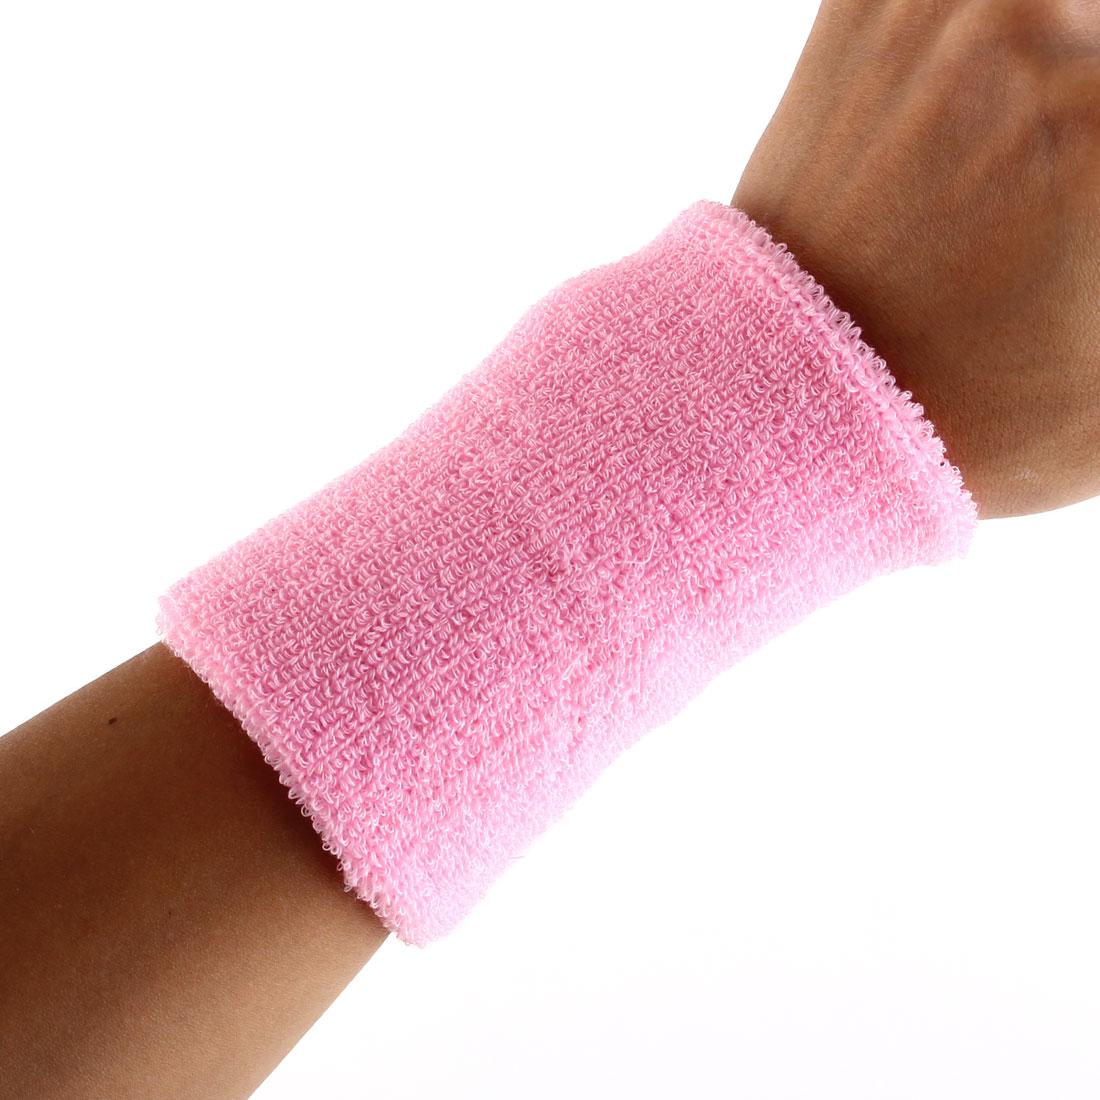 Exercises Football Gym Elastic Strap Hand Protector Sweatband Sport Wrist Pink 2pcs